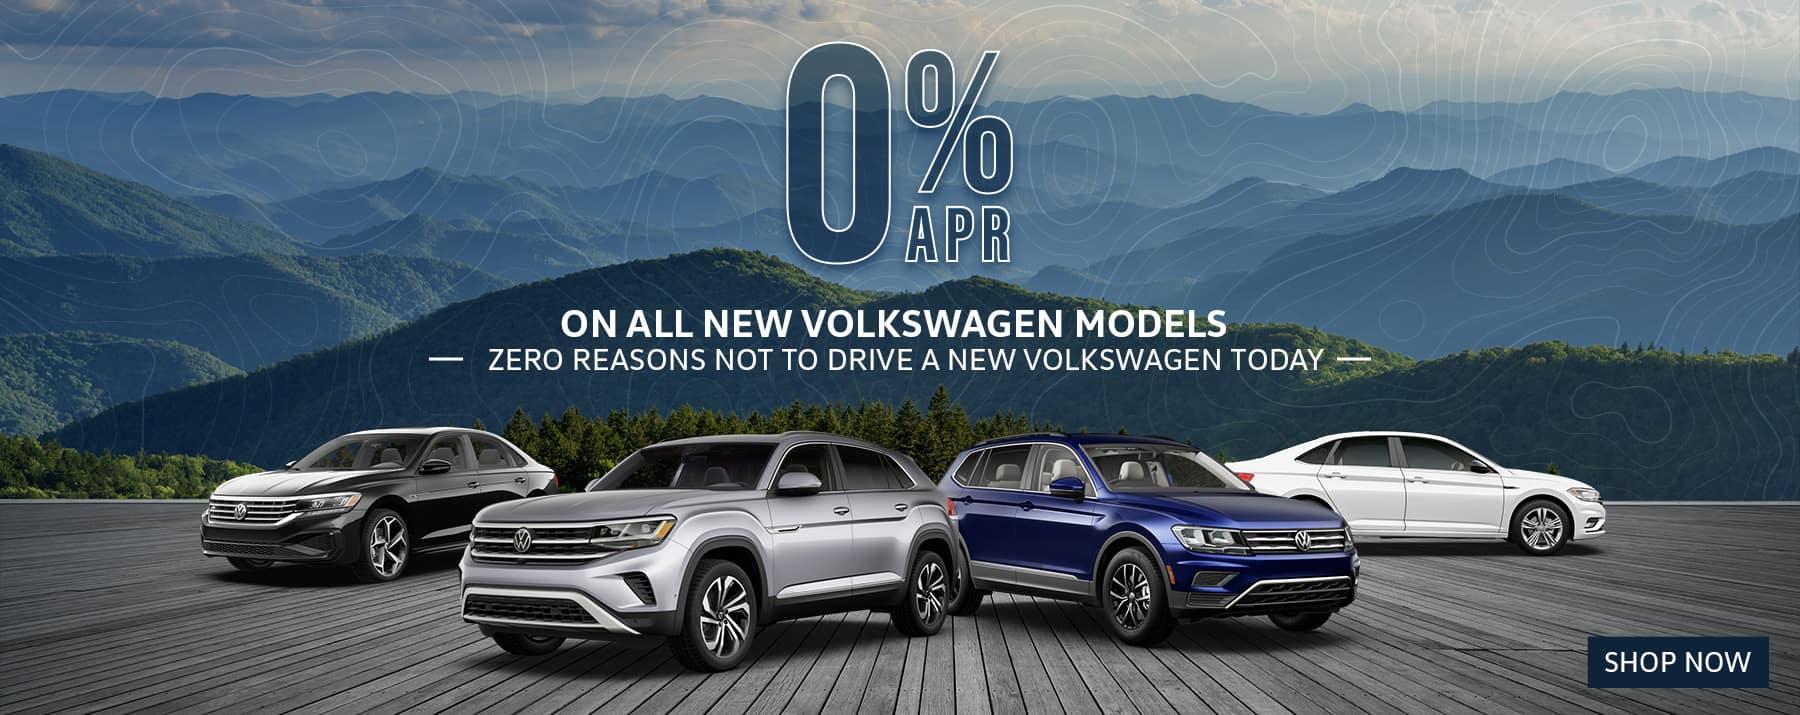 VW 0% APR